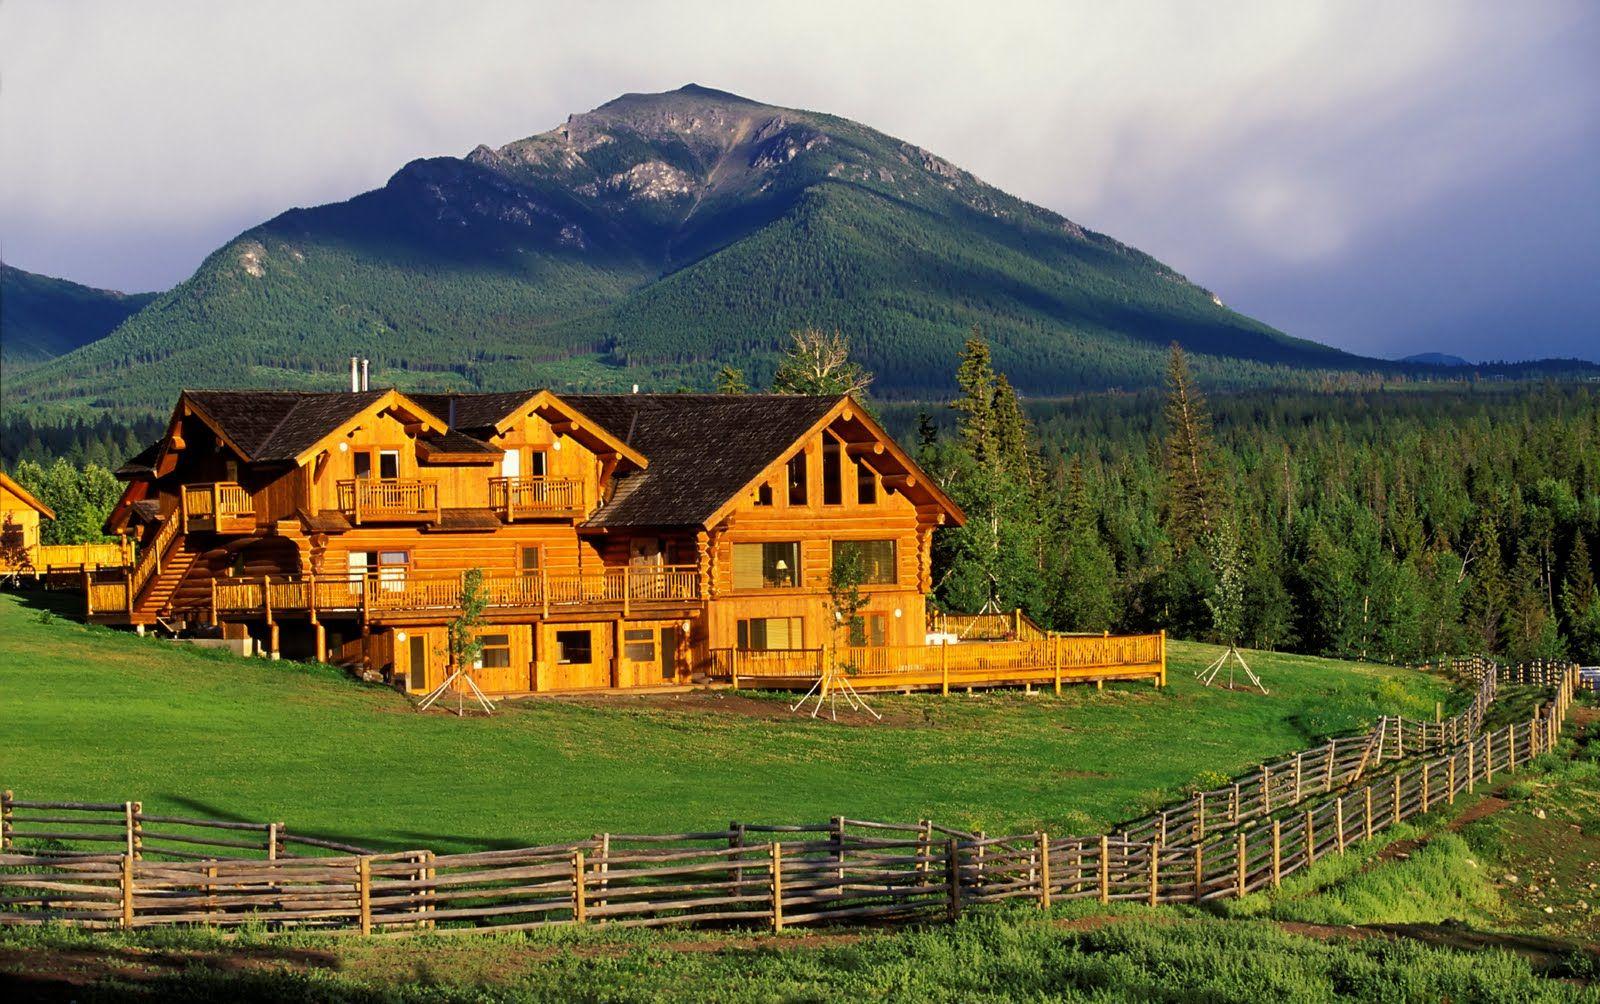 Log Cabin Ranch Home For Sale In Montana Aspiring MT RanchHorse